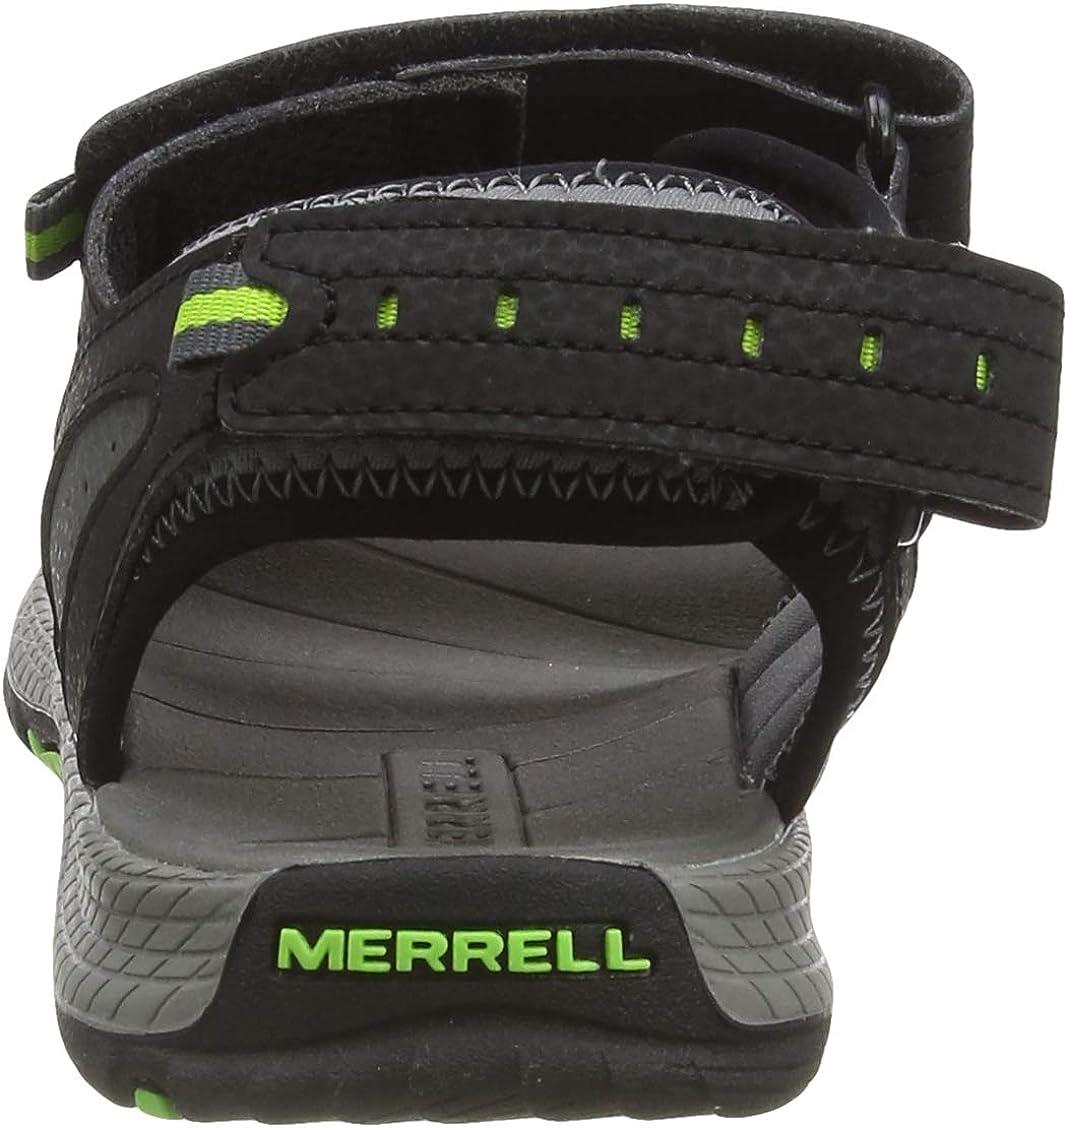 Merrell Kid's Panther Sandal 2.0 Sport